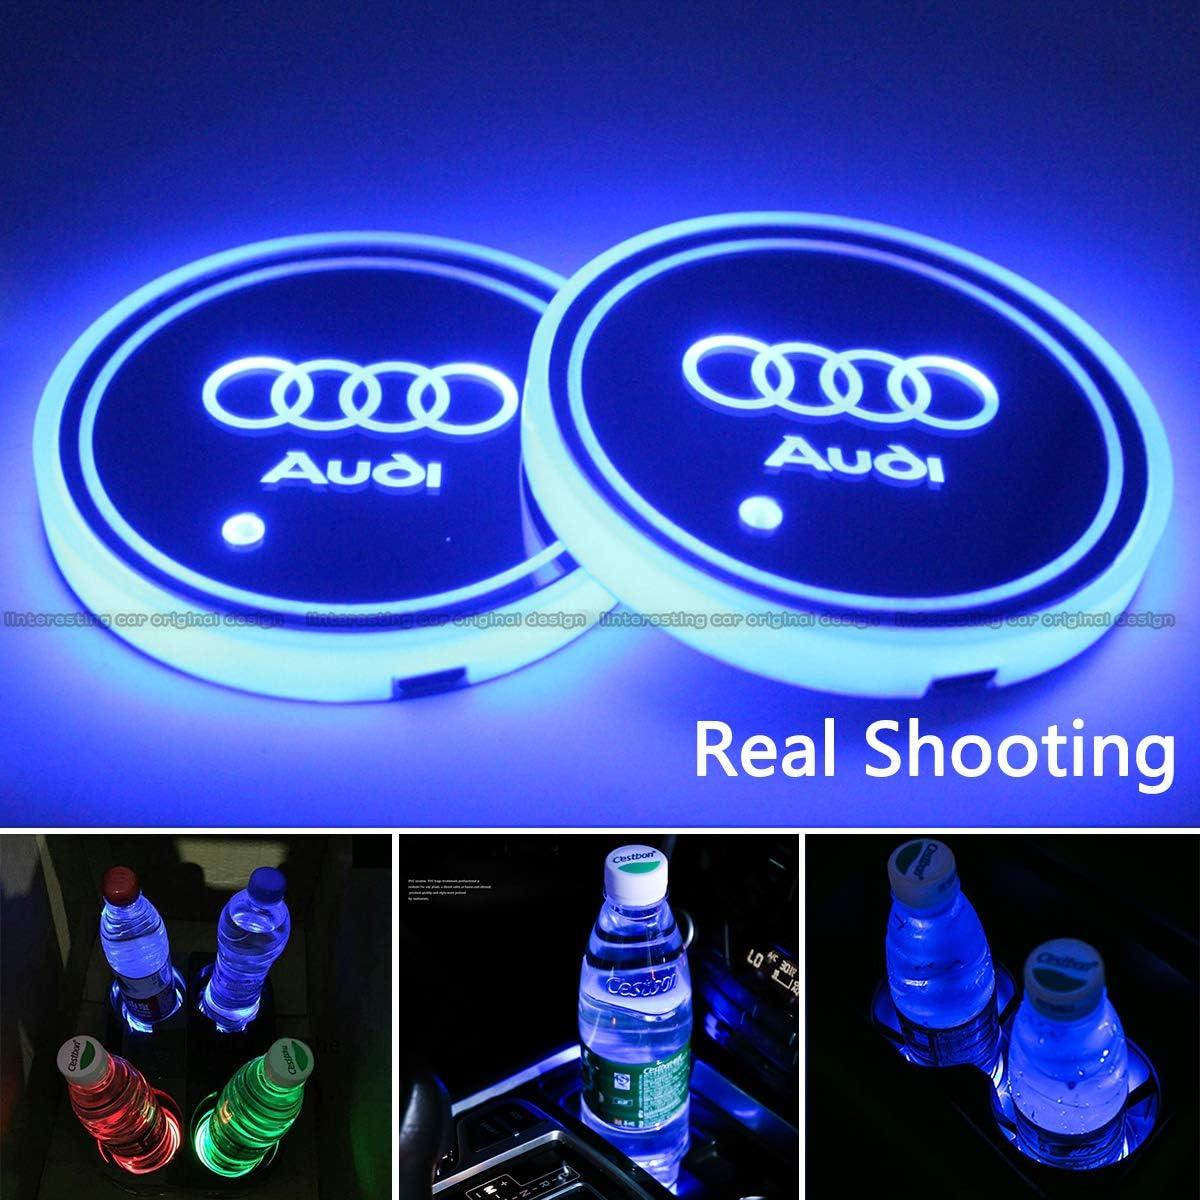 Juego de luces LED de alta calidad Q5 SQ5 para interior completo color blanco